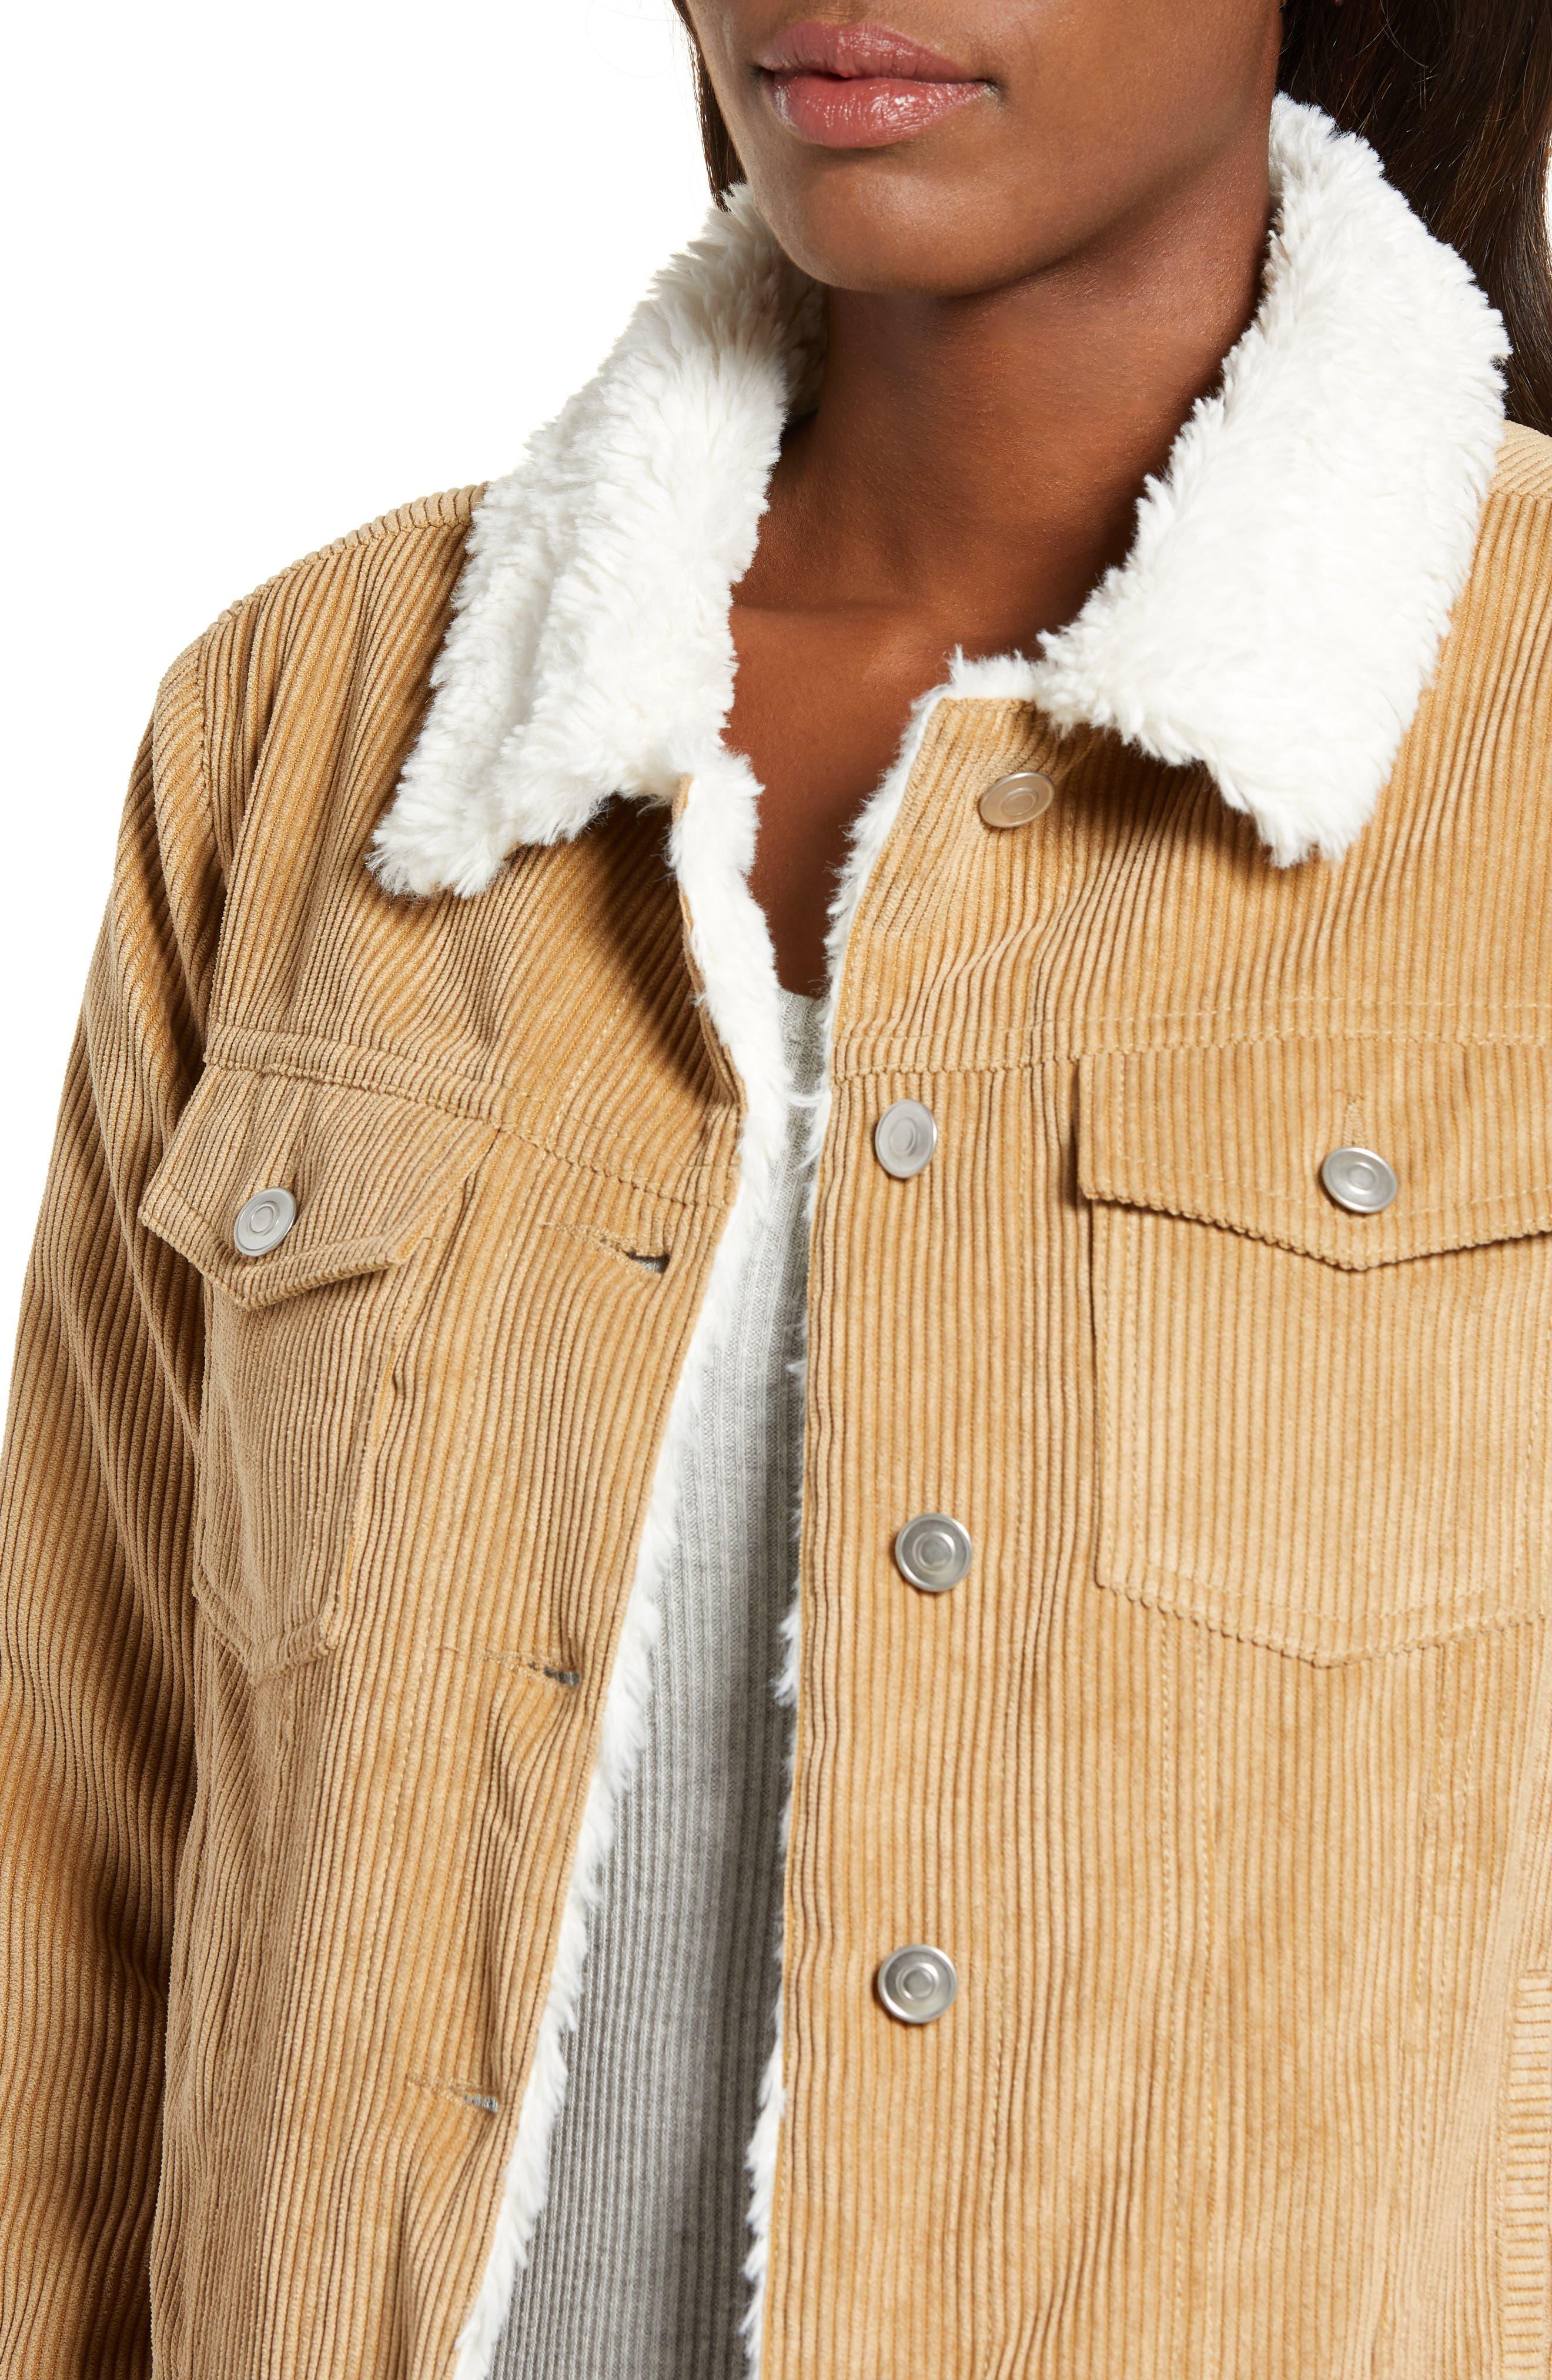 THREAD & SUPPLY, Paddington Fleece Lined Corduroy Jacket, Alternate thumbnail 5, color, KHAKI